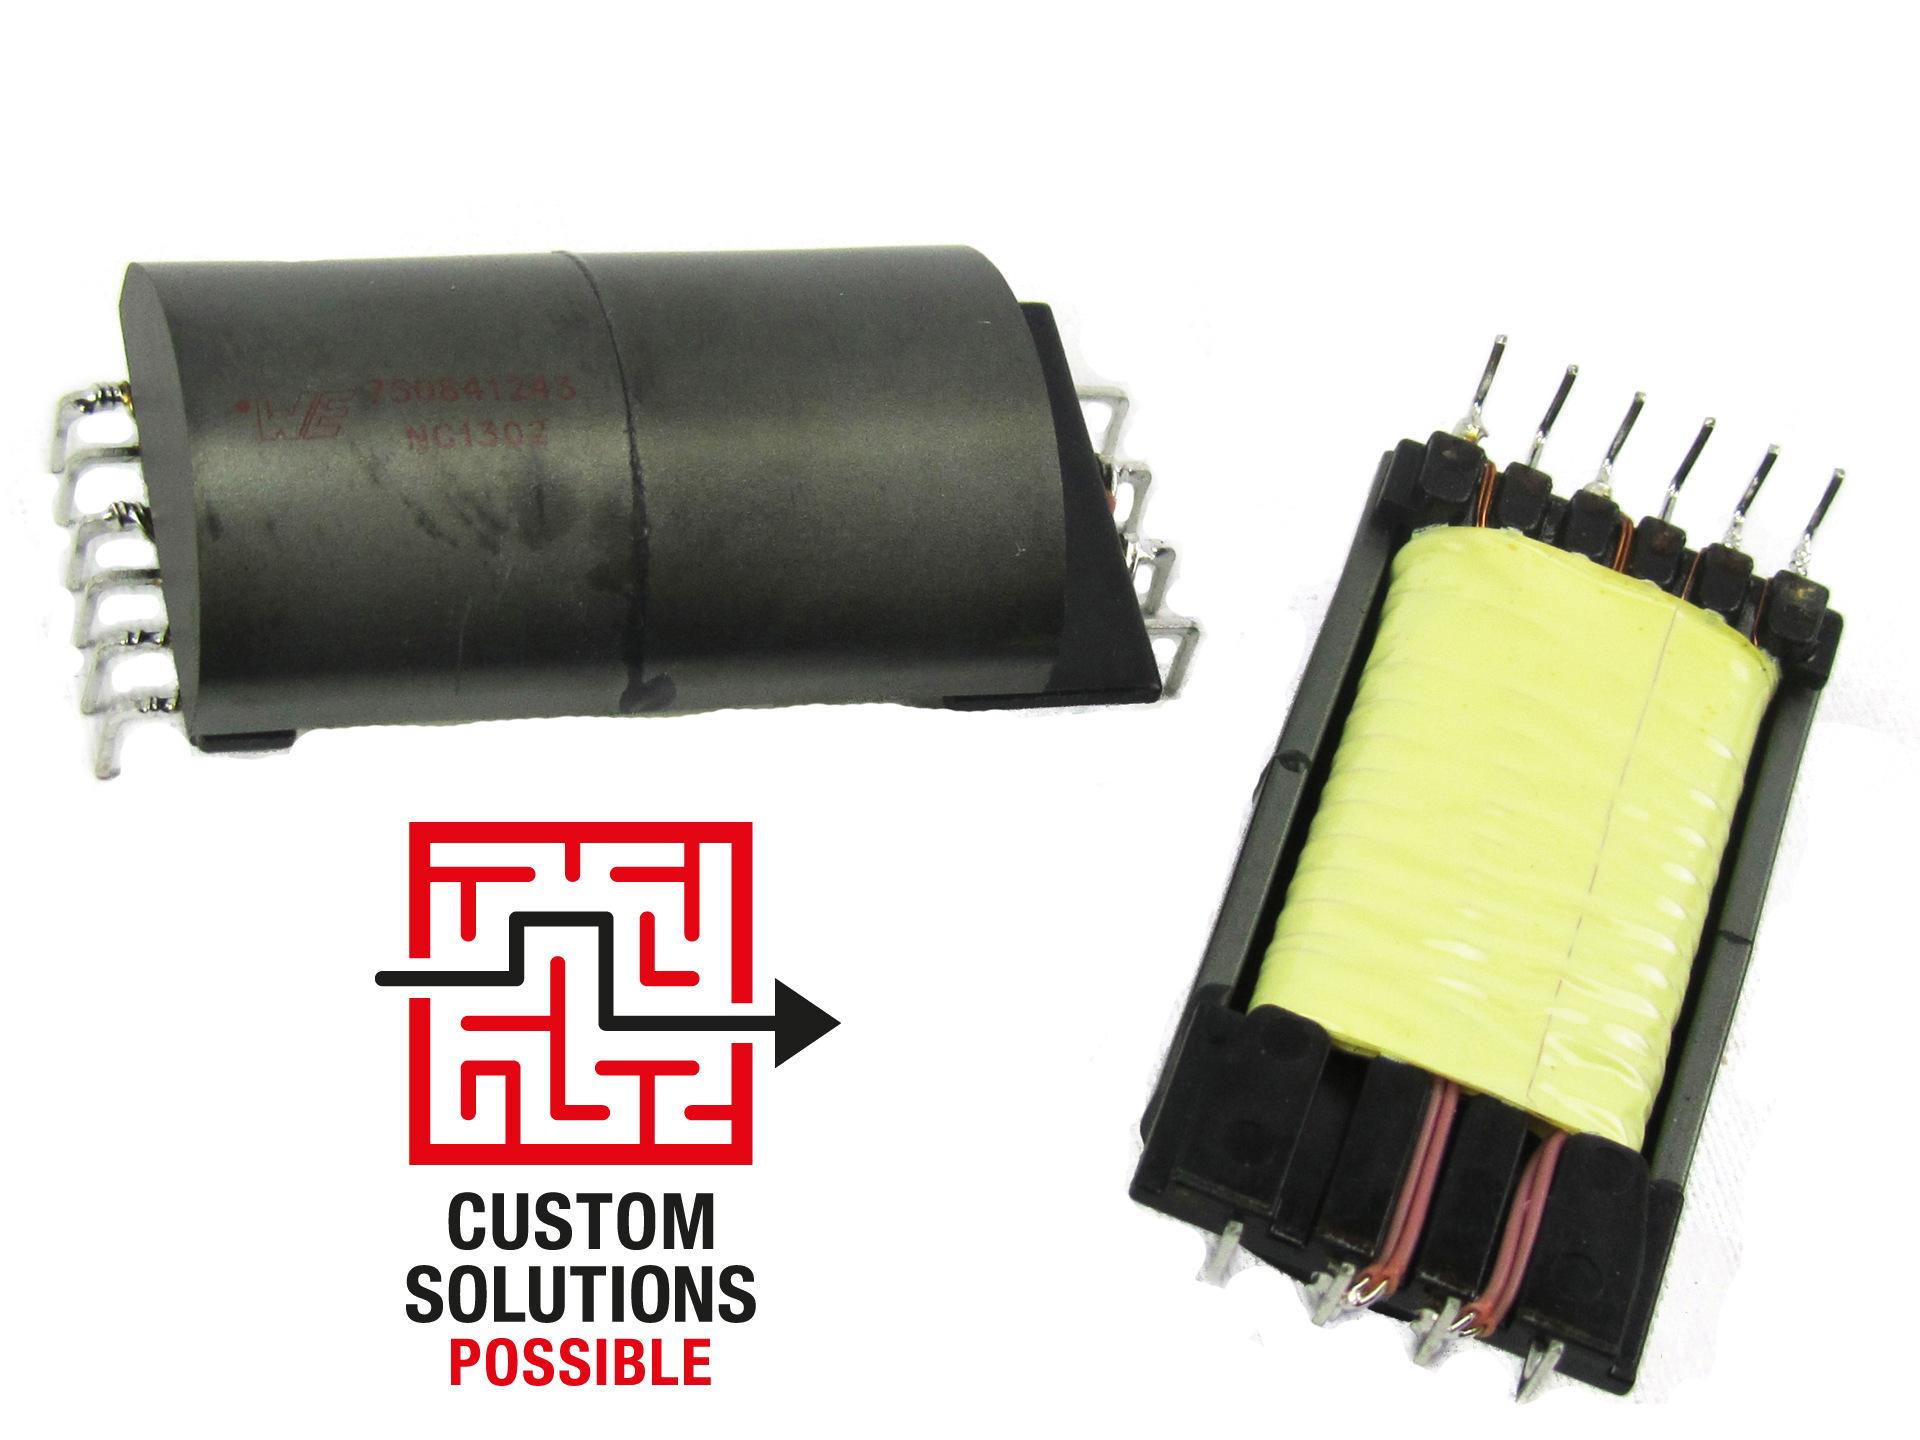 MID-OLT8 T8-Style Offline Flyback Transformers for LED Tube